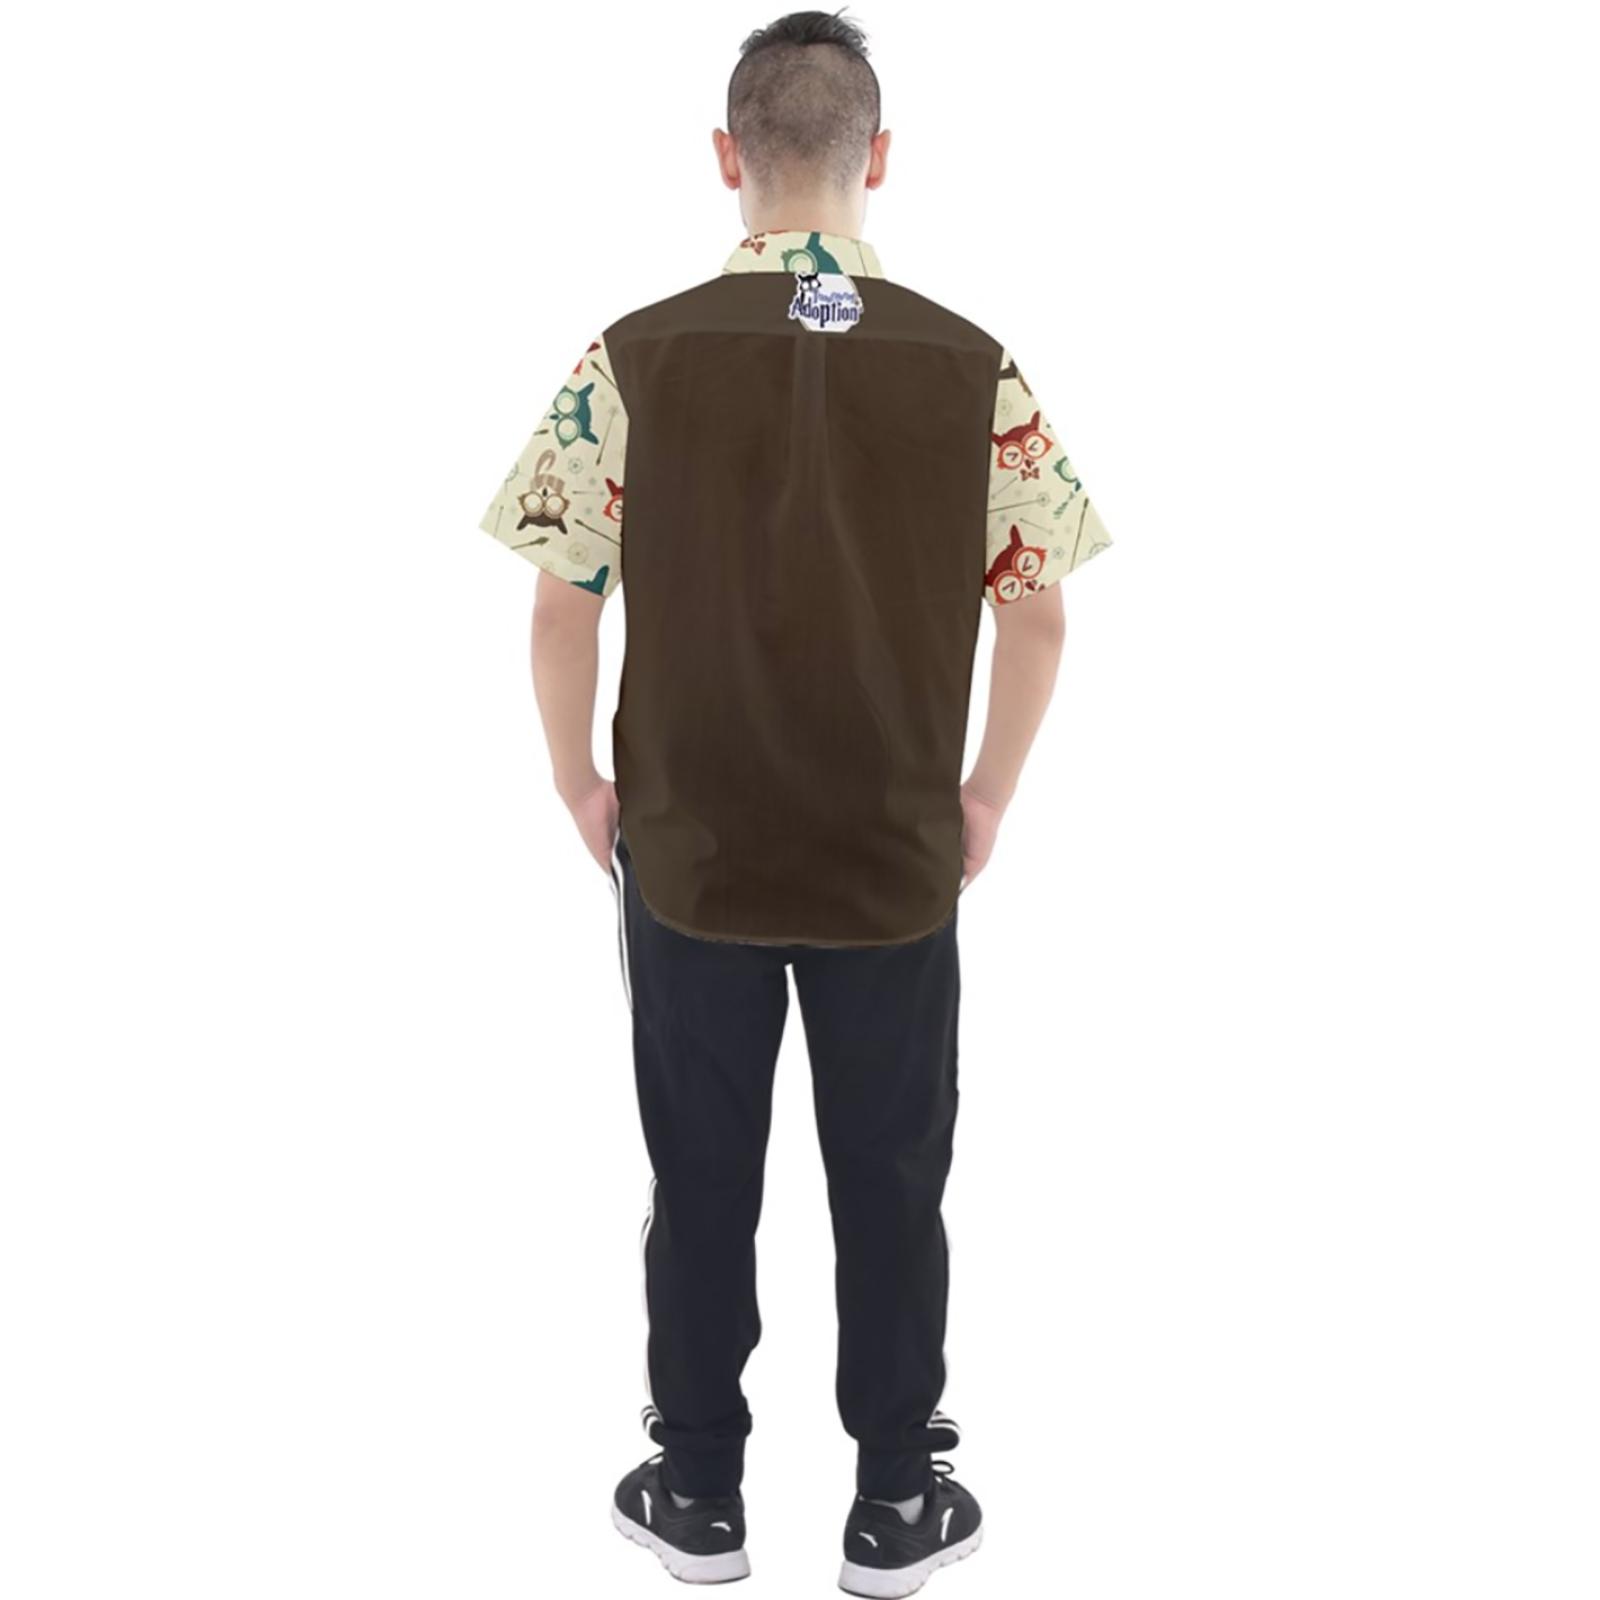 Vintage Emoji Owl Button Up Short Sleeve Shirt (Brown Solid Background)